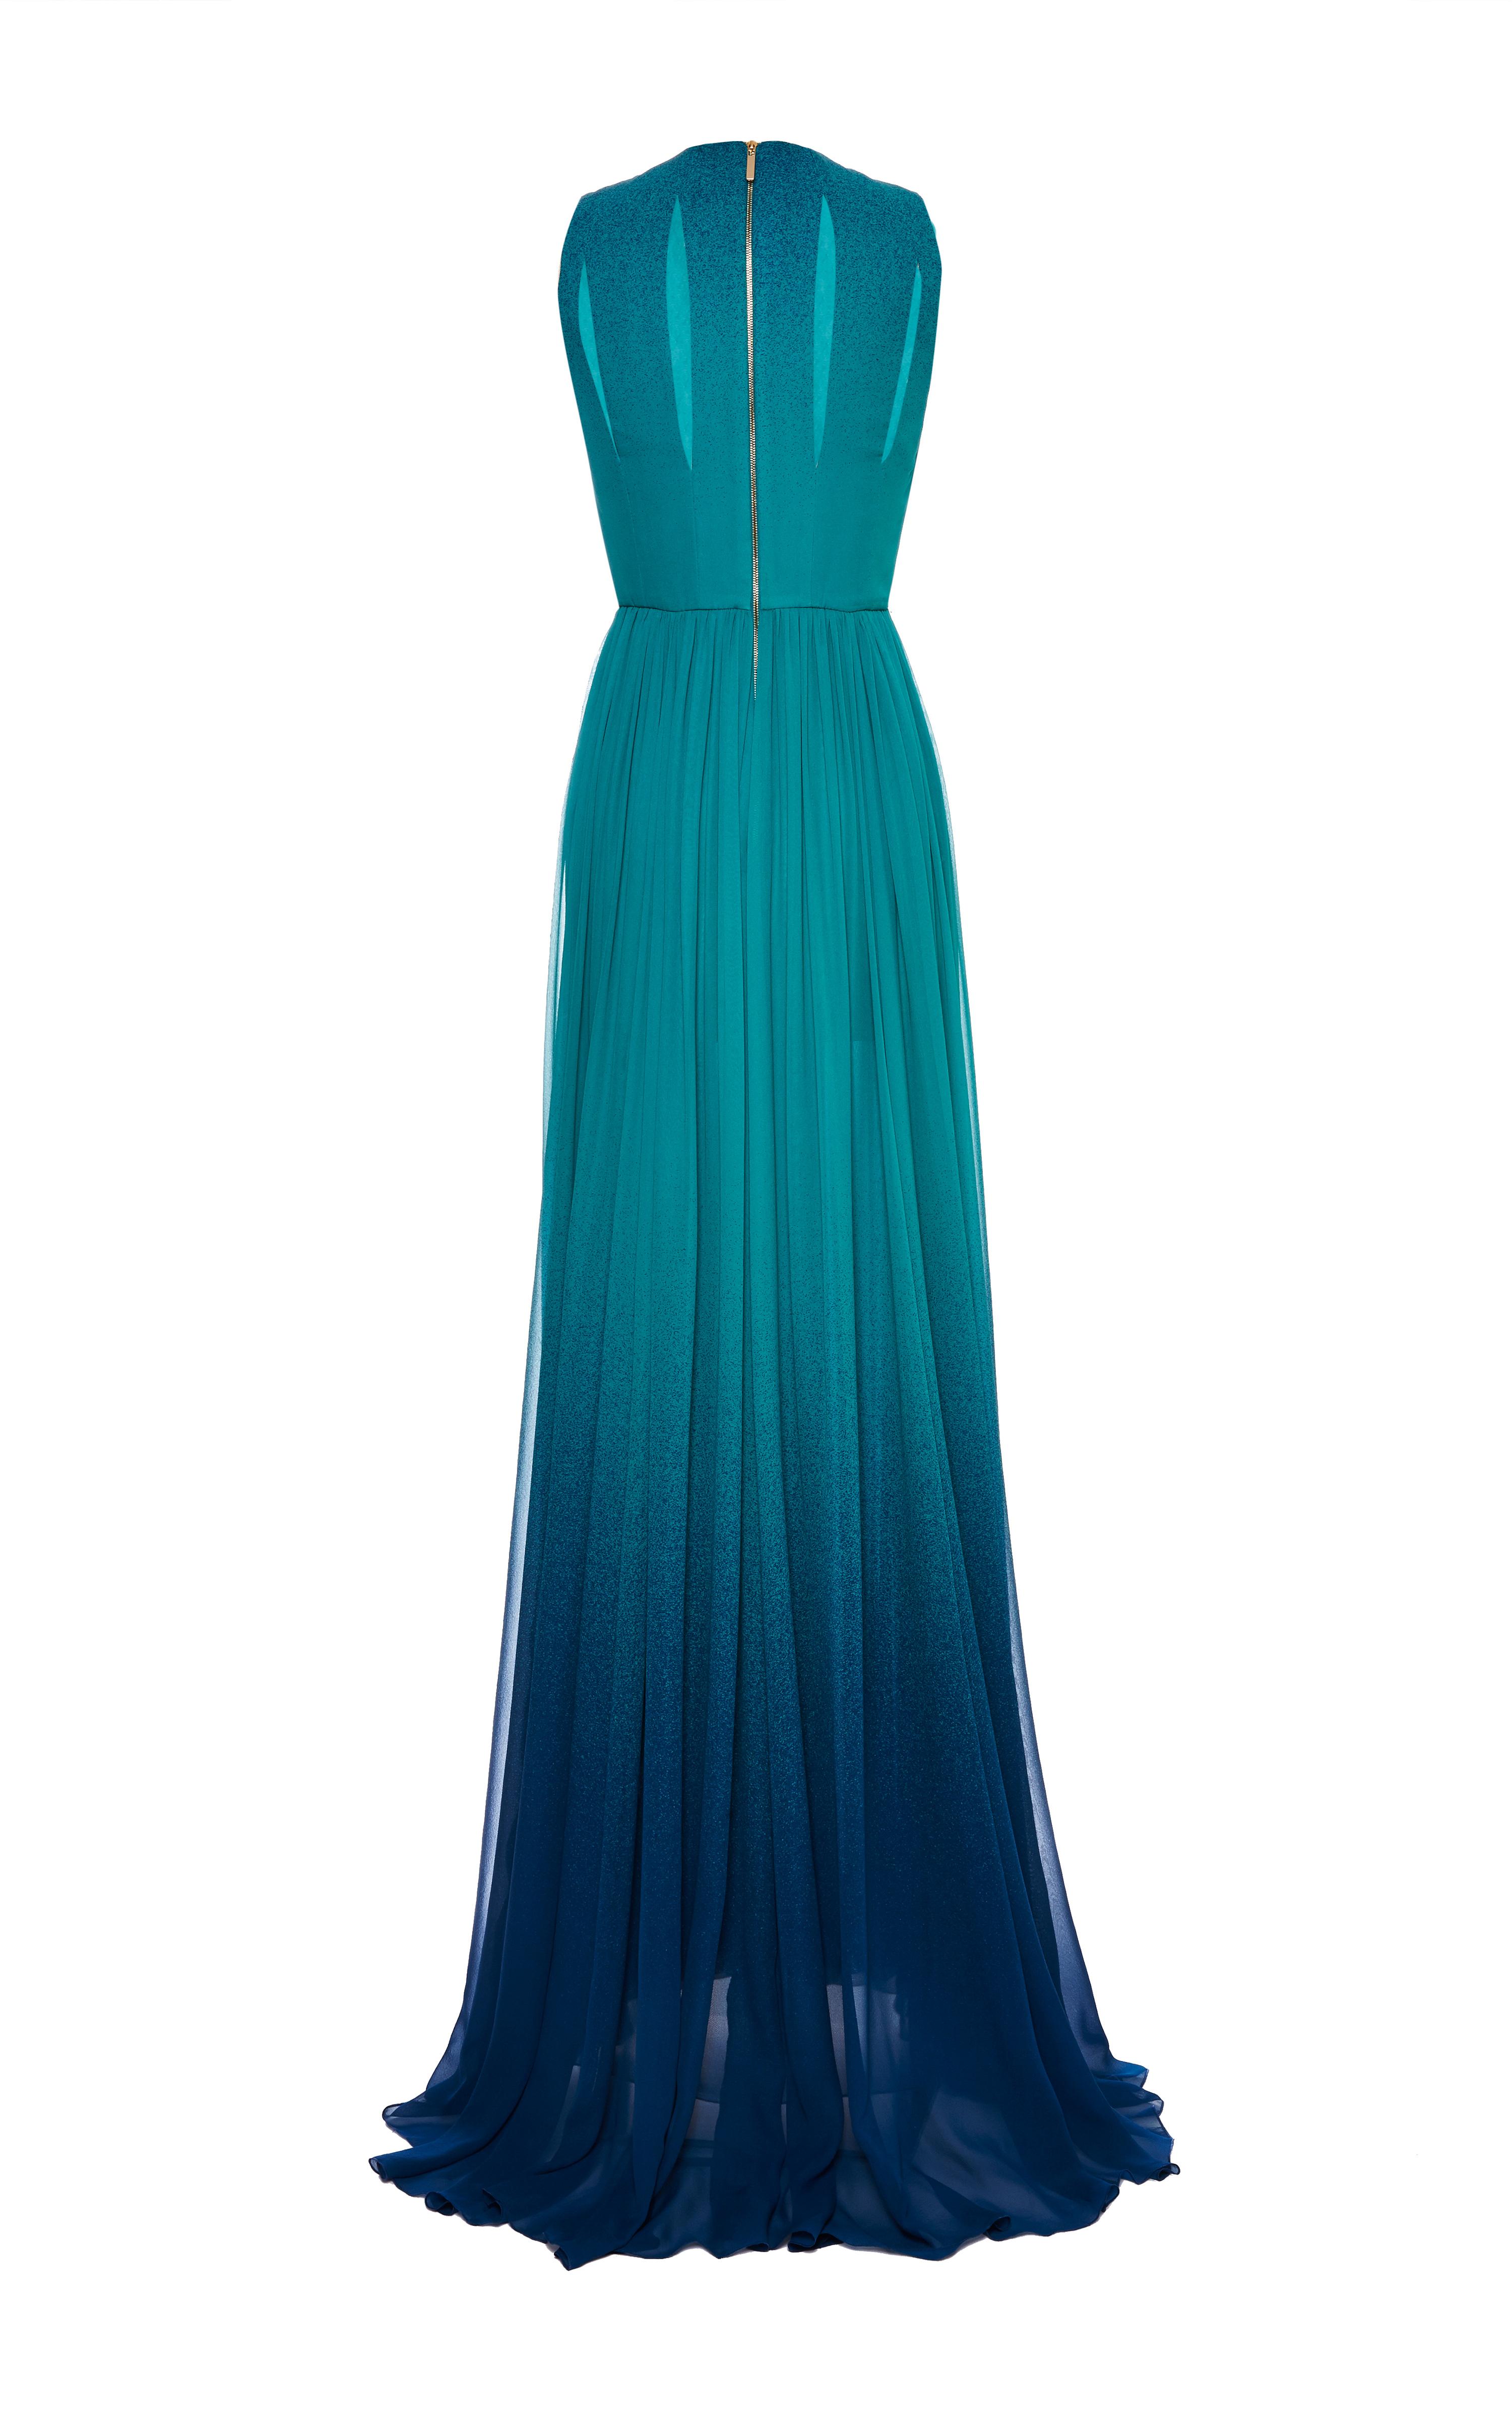 Lyst - Elie Saab Turquoise Degrade Silk Georgette Dress in Blue